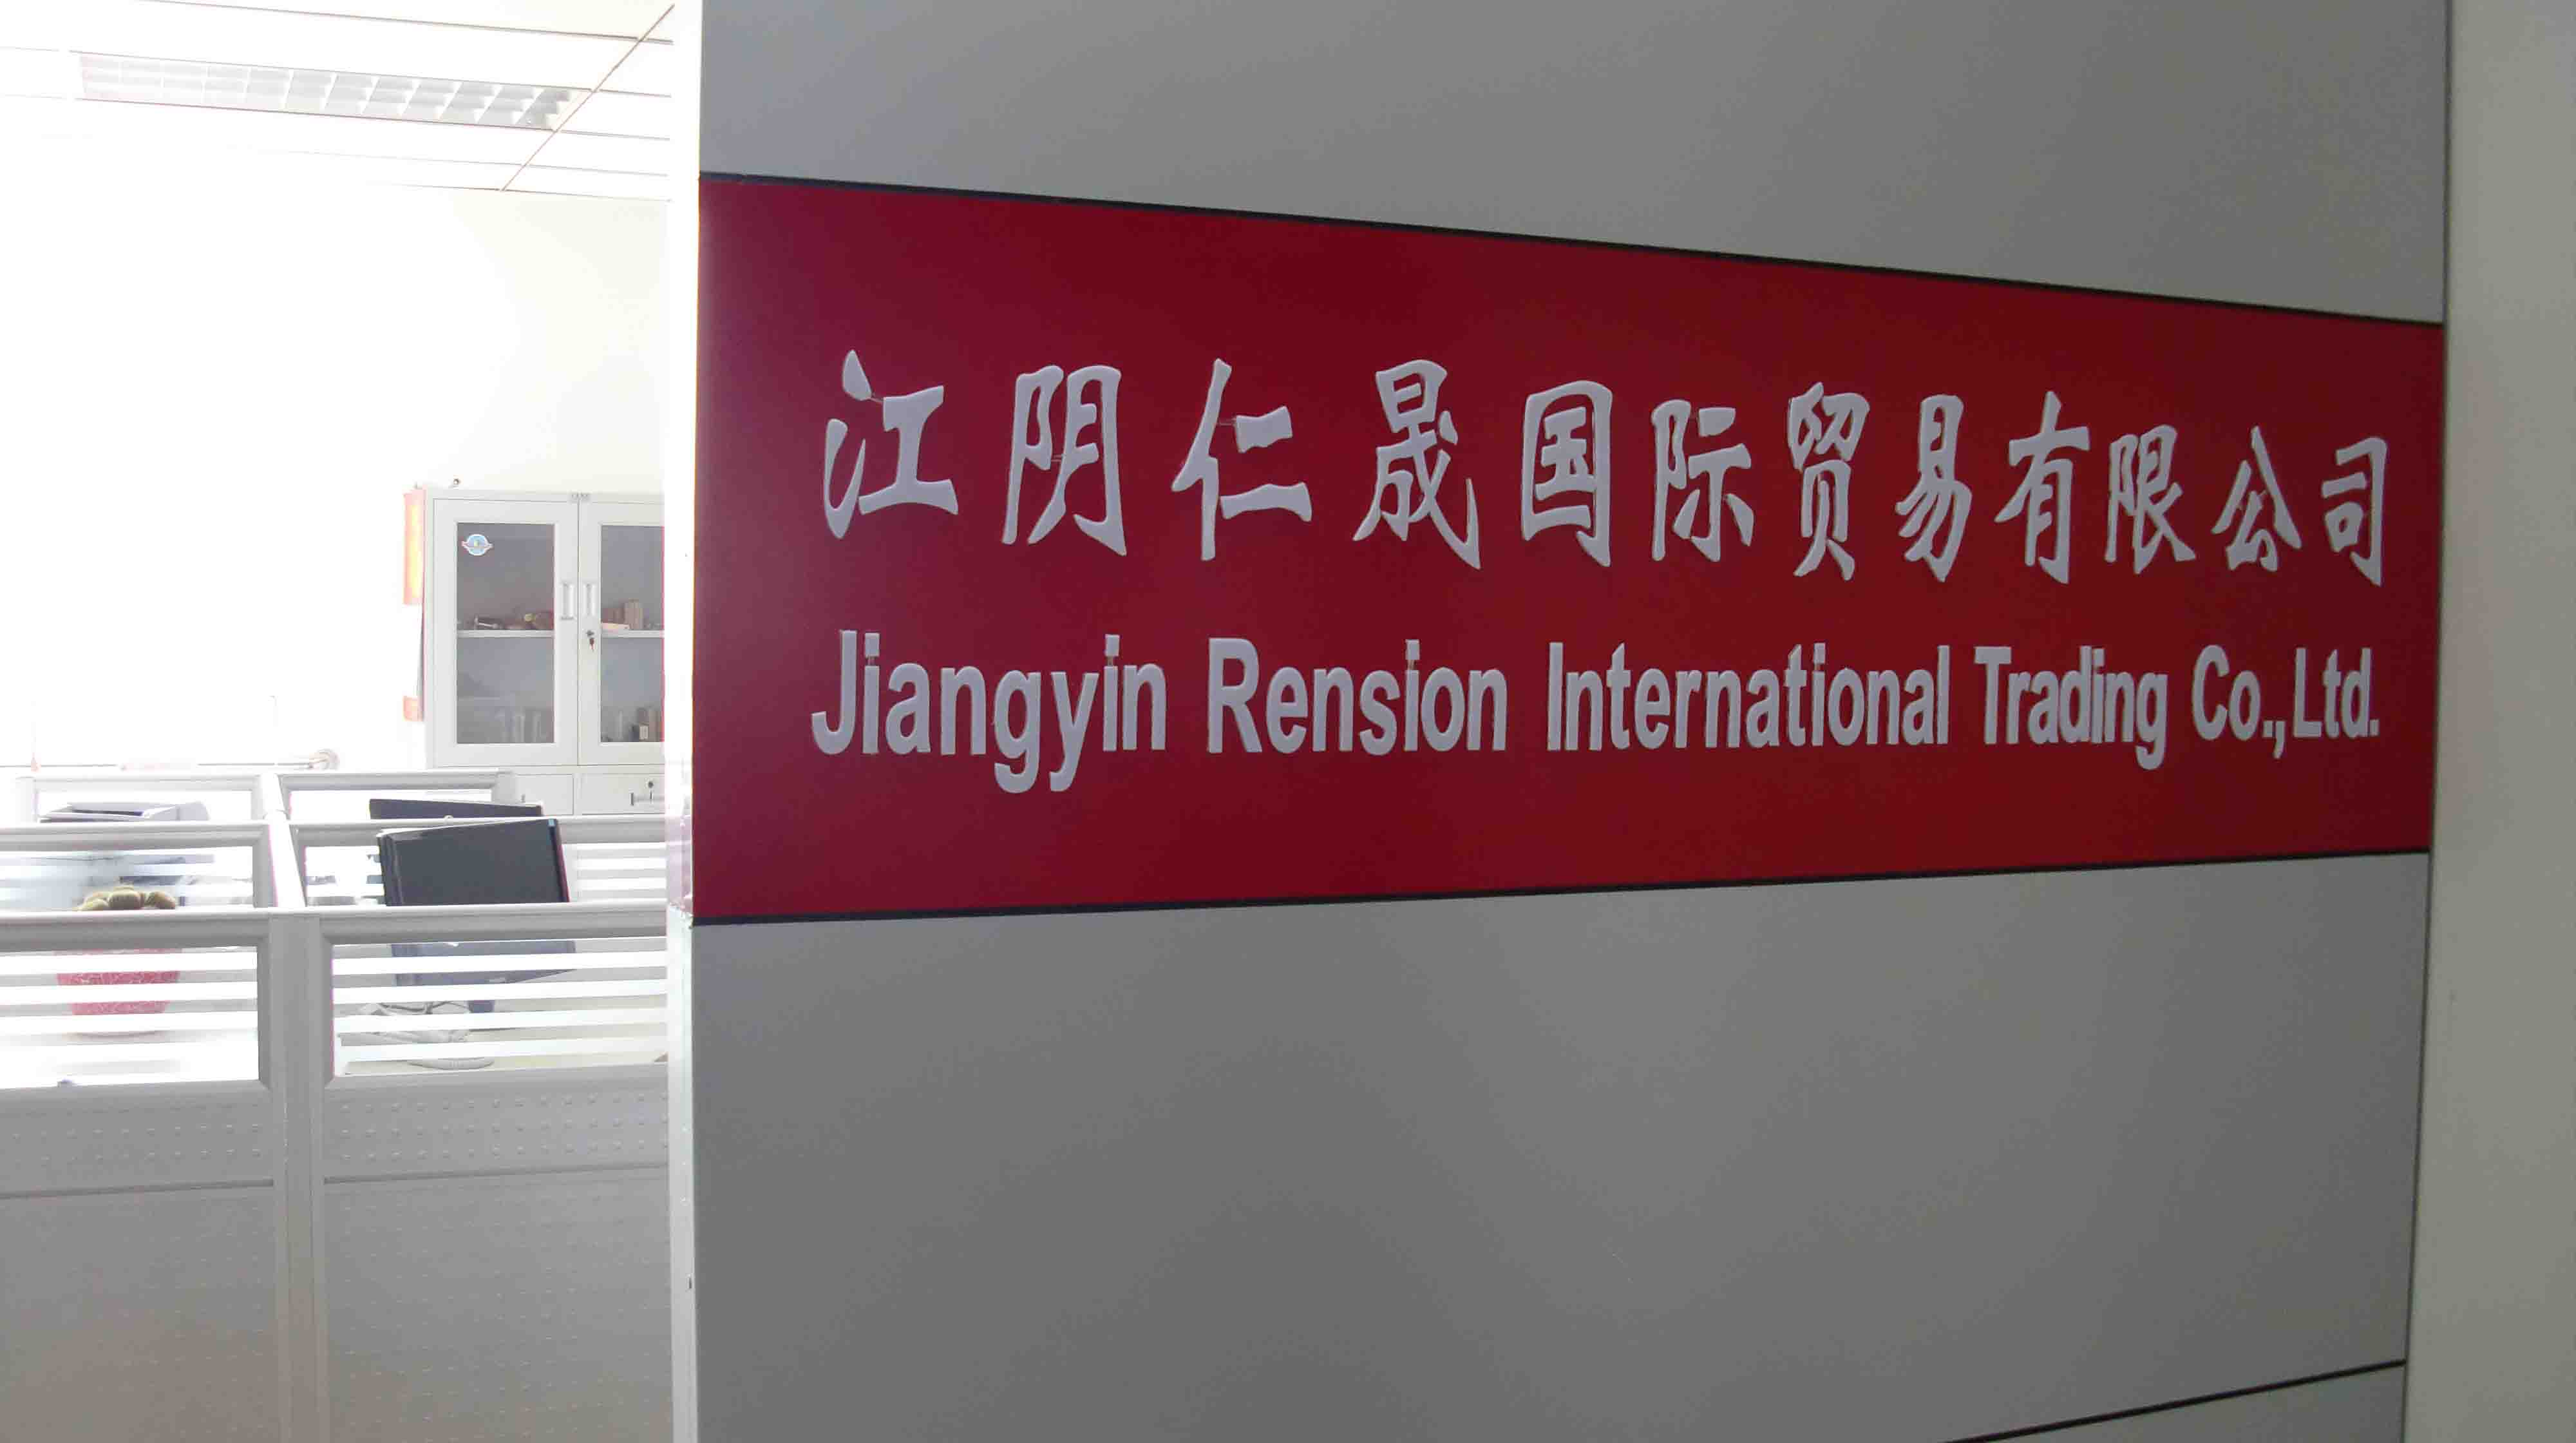 Jiangyin Rension International Trading Co., Ltd.